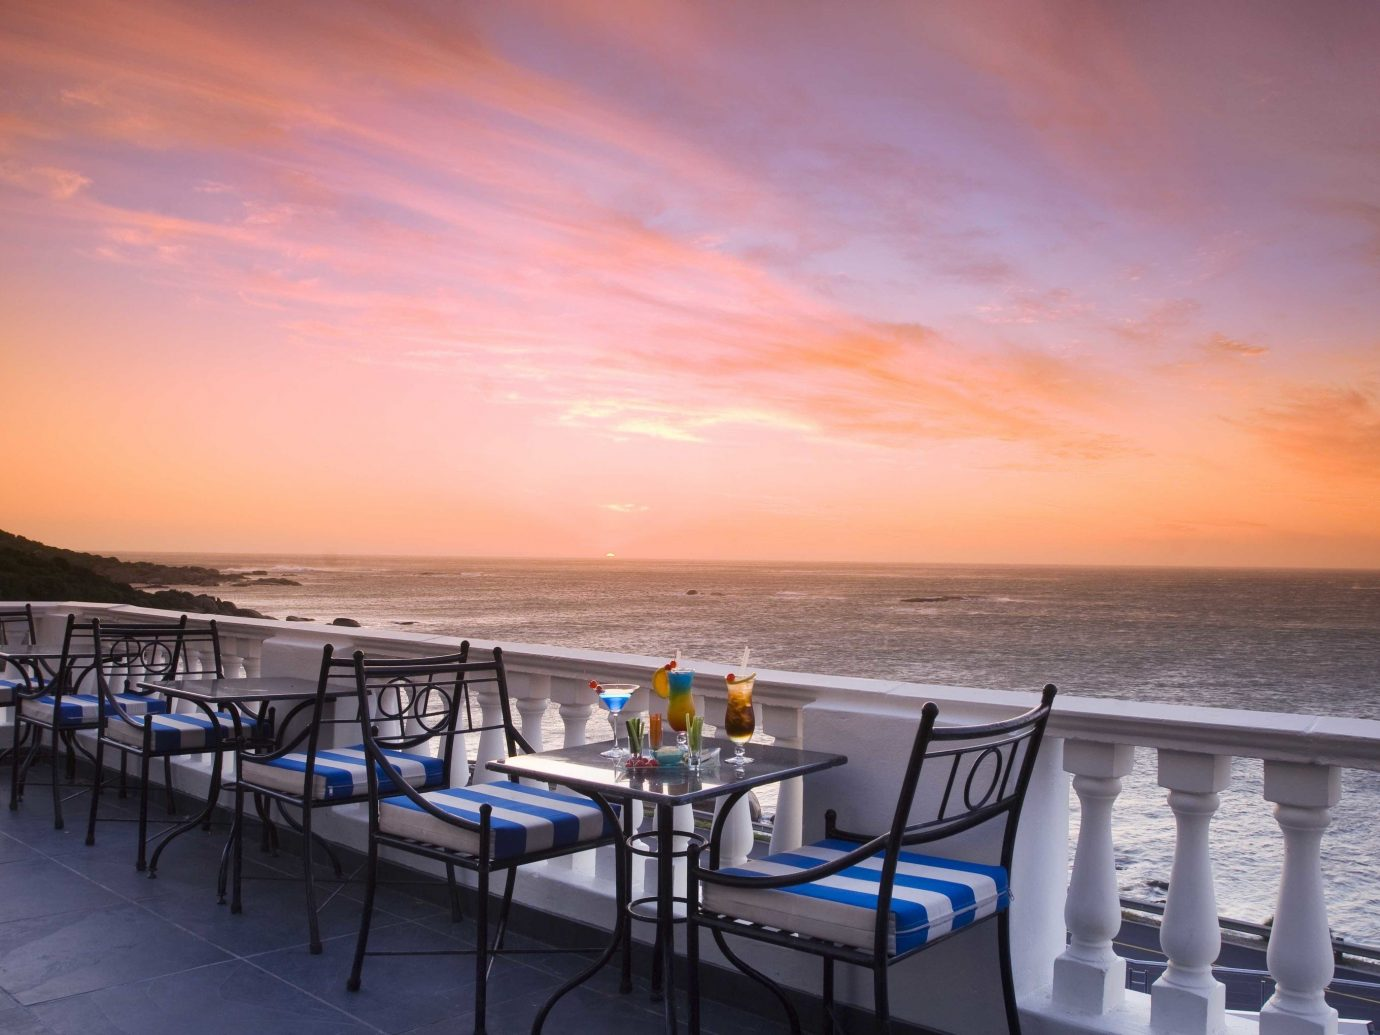 Hotels sky water outdoor Beach Sea Ocean horizon vacation Sunset Coast evening dusk bay shore sandy